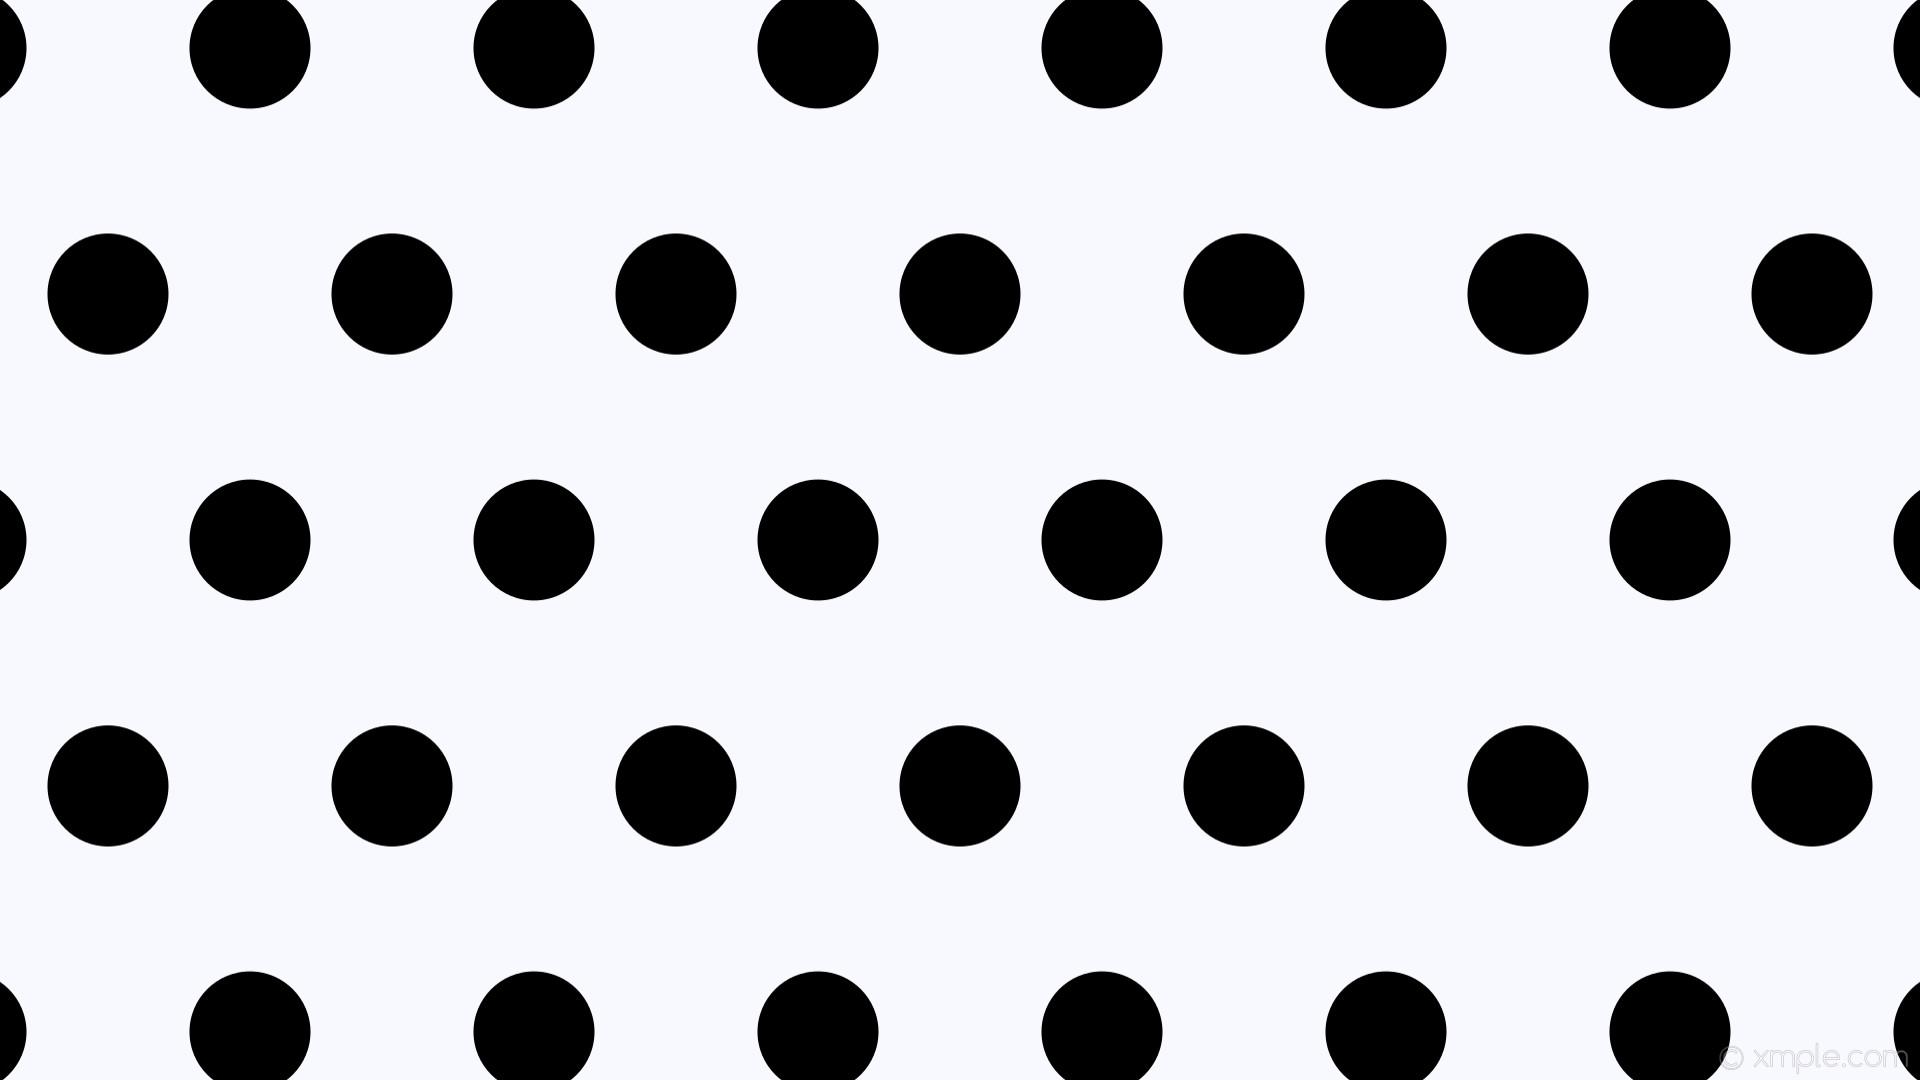 wallpaper black polka dots hexagon white ghost white #f8f8ff #000000 0°  121px 284px